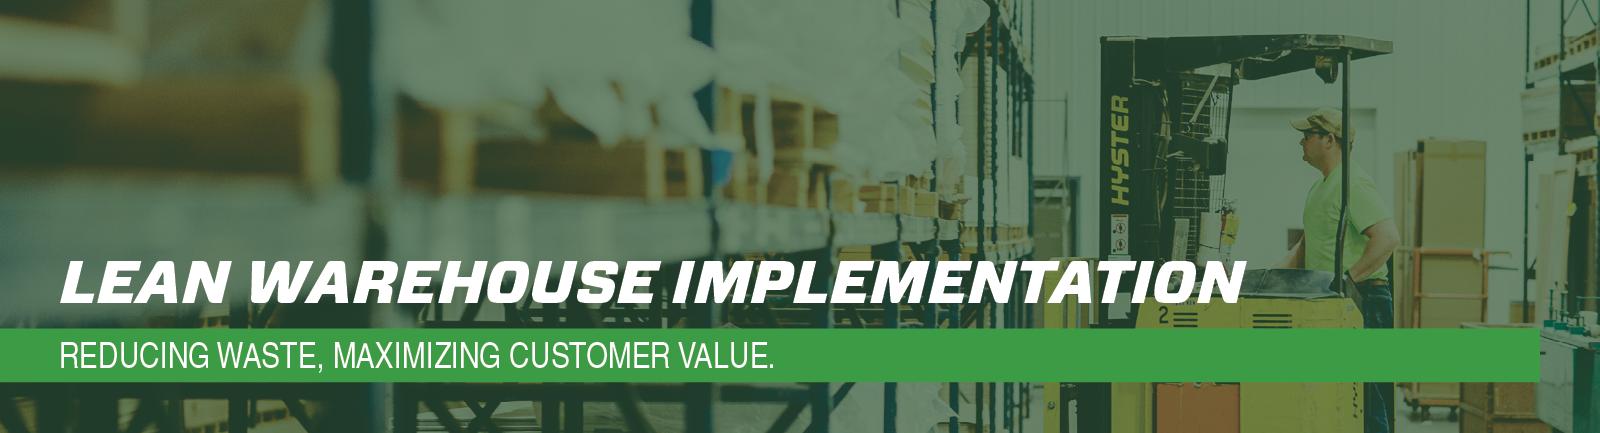 Lean Warehouse Implementation